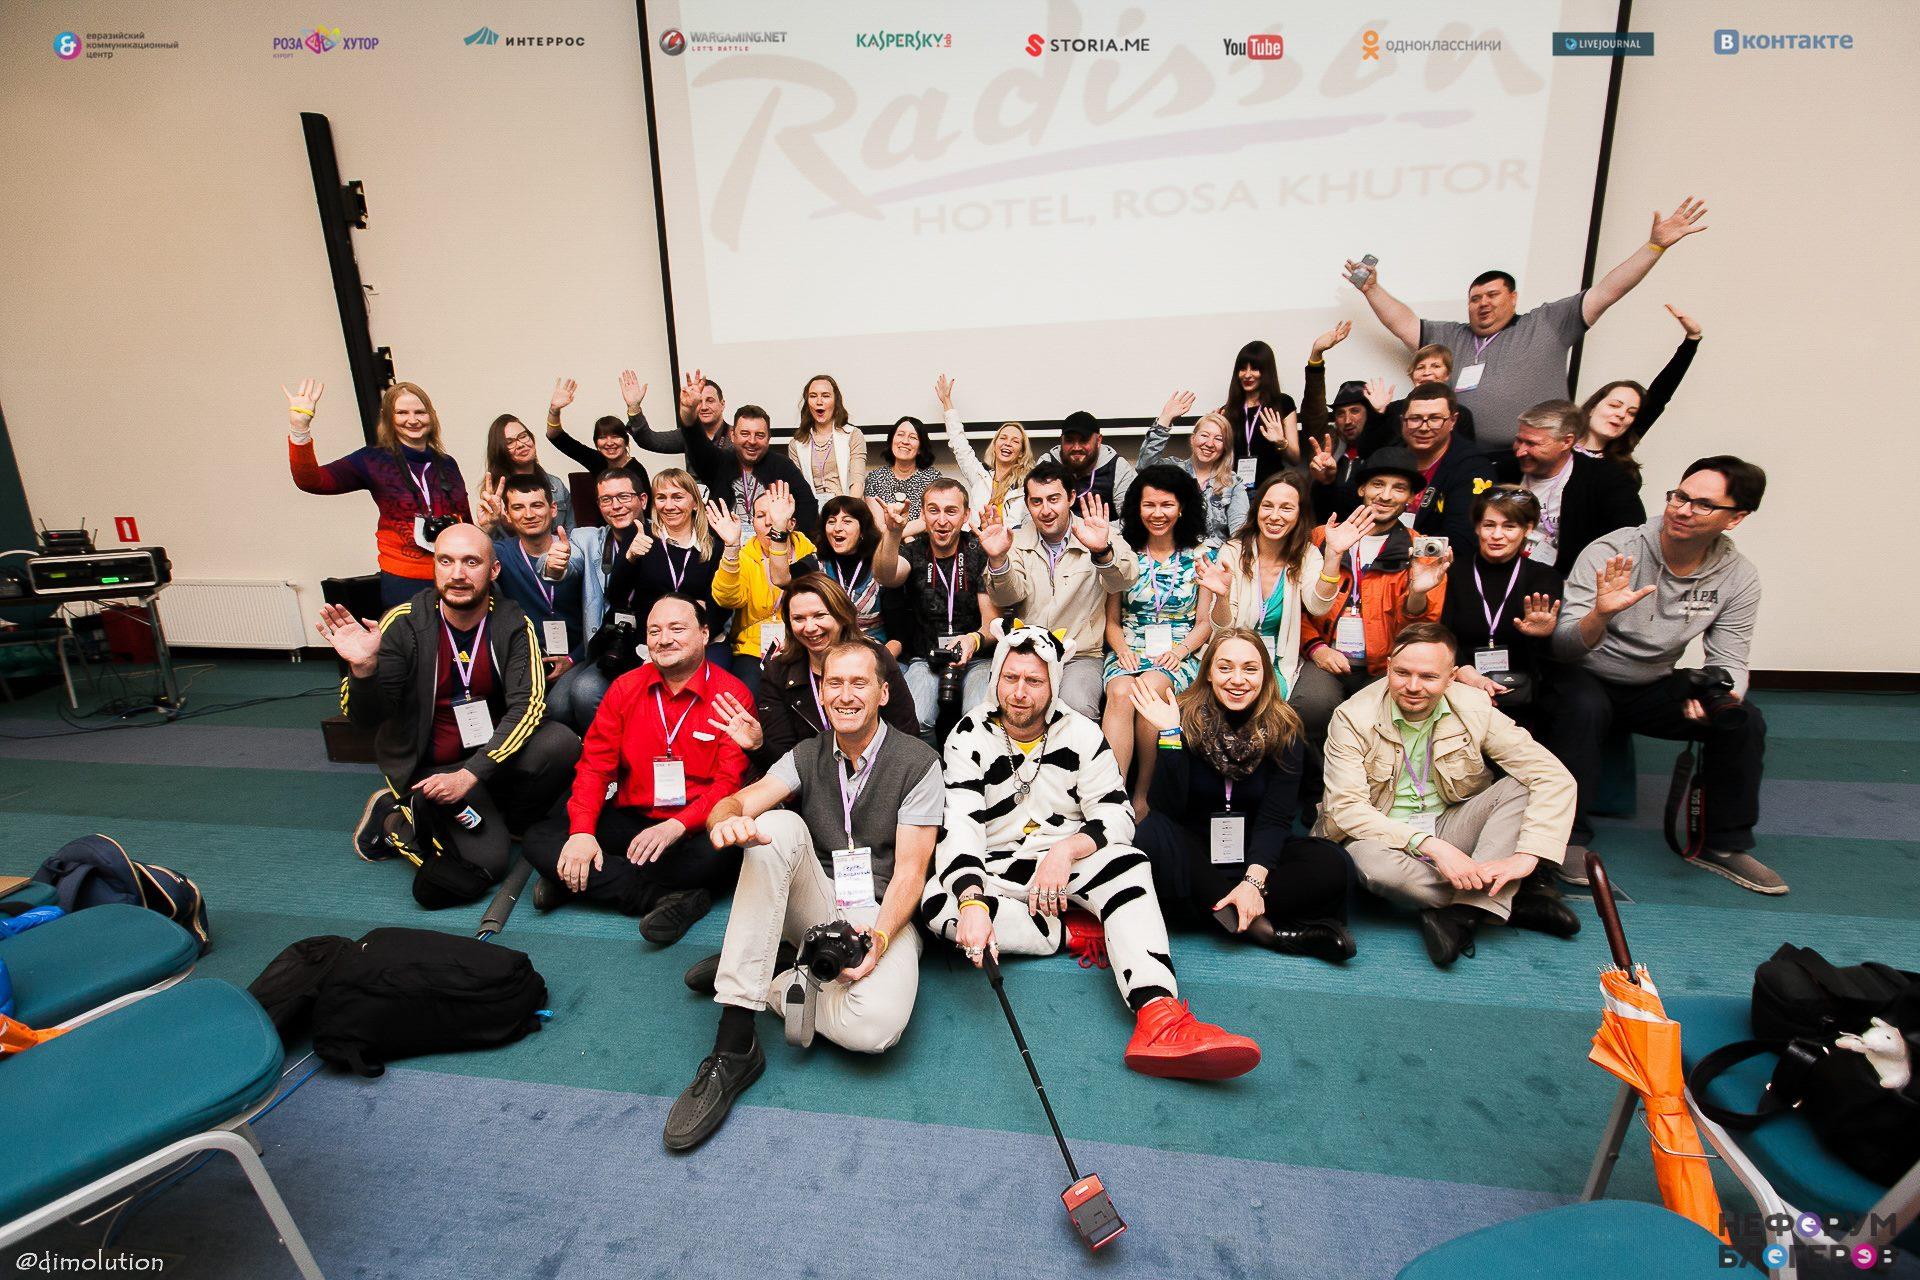 НеФорум 2017 - общее фото секция ЖЖ